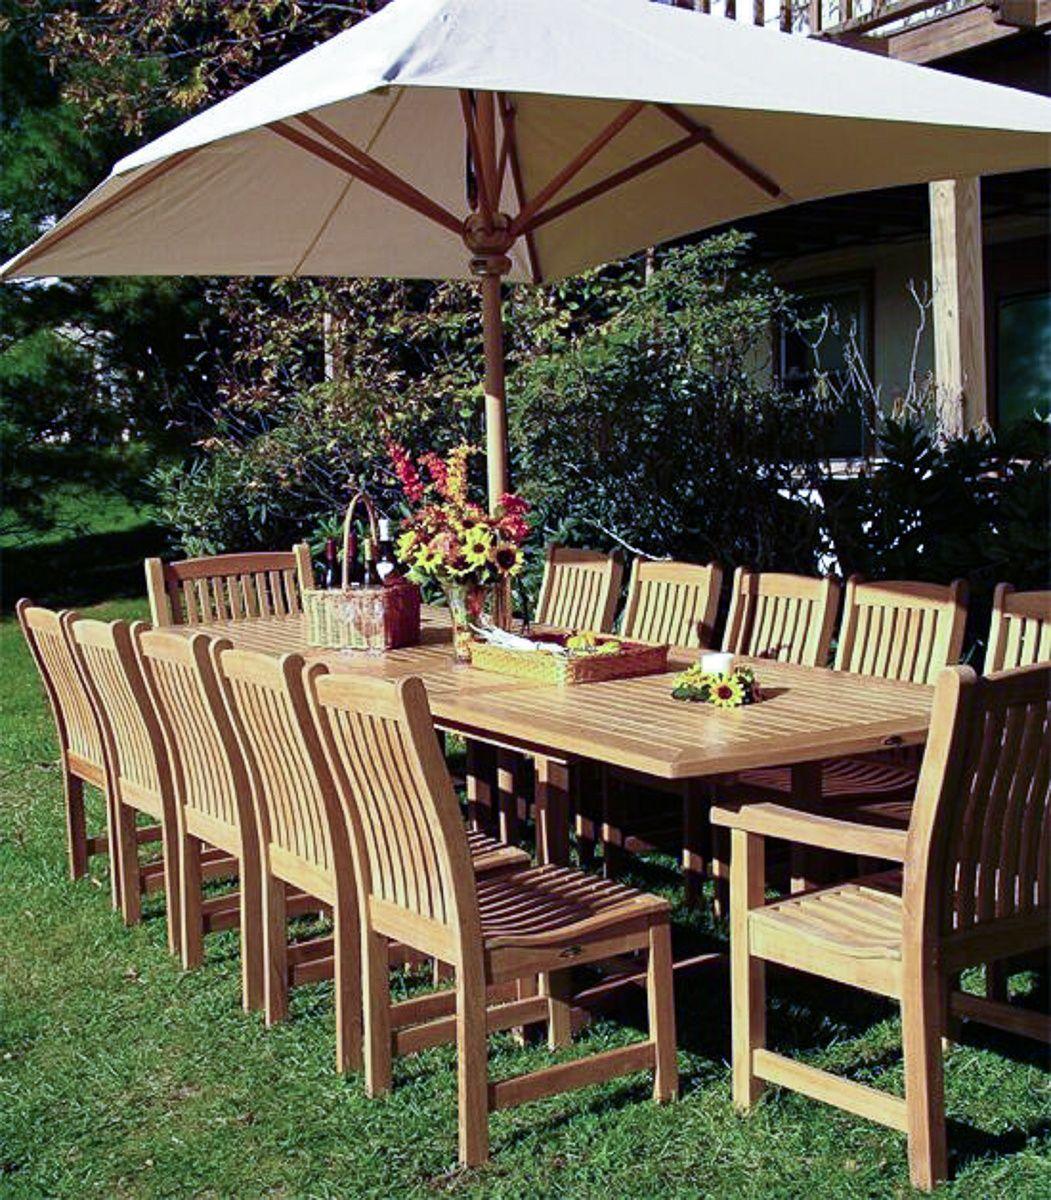 13 Pc Grand Veranda Teak Dining Set Westminster Teak Teak Outdoor Furniture Teak Outdoor Teak Furniture Set